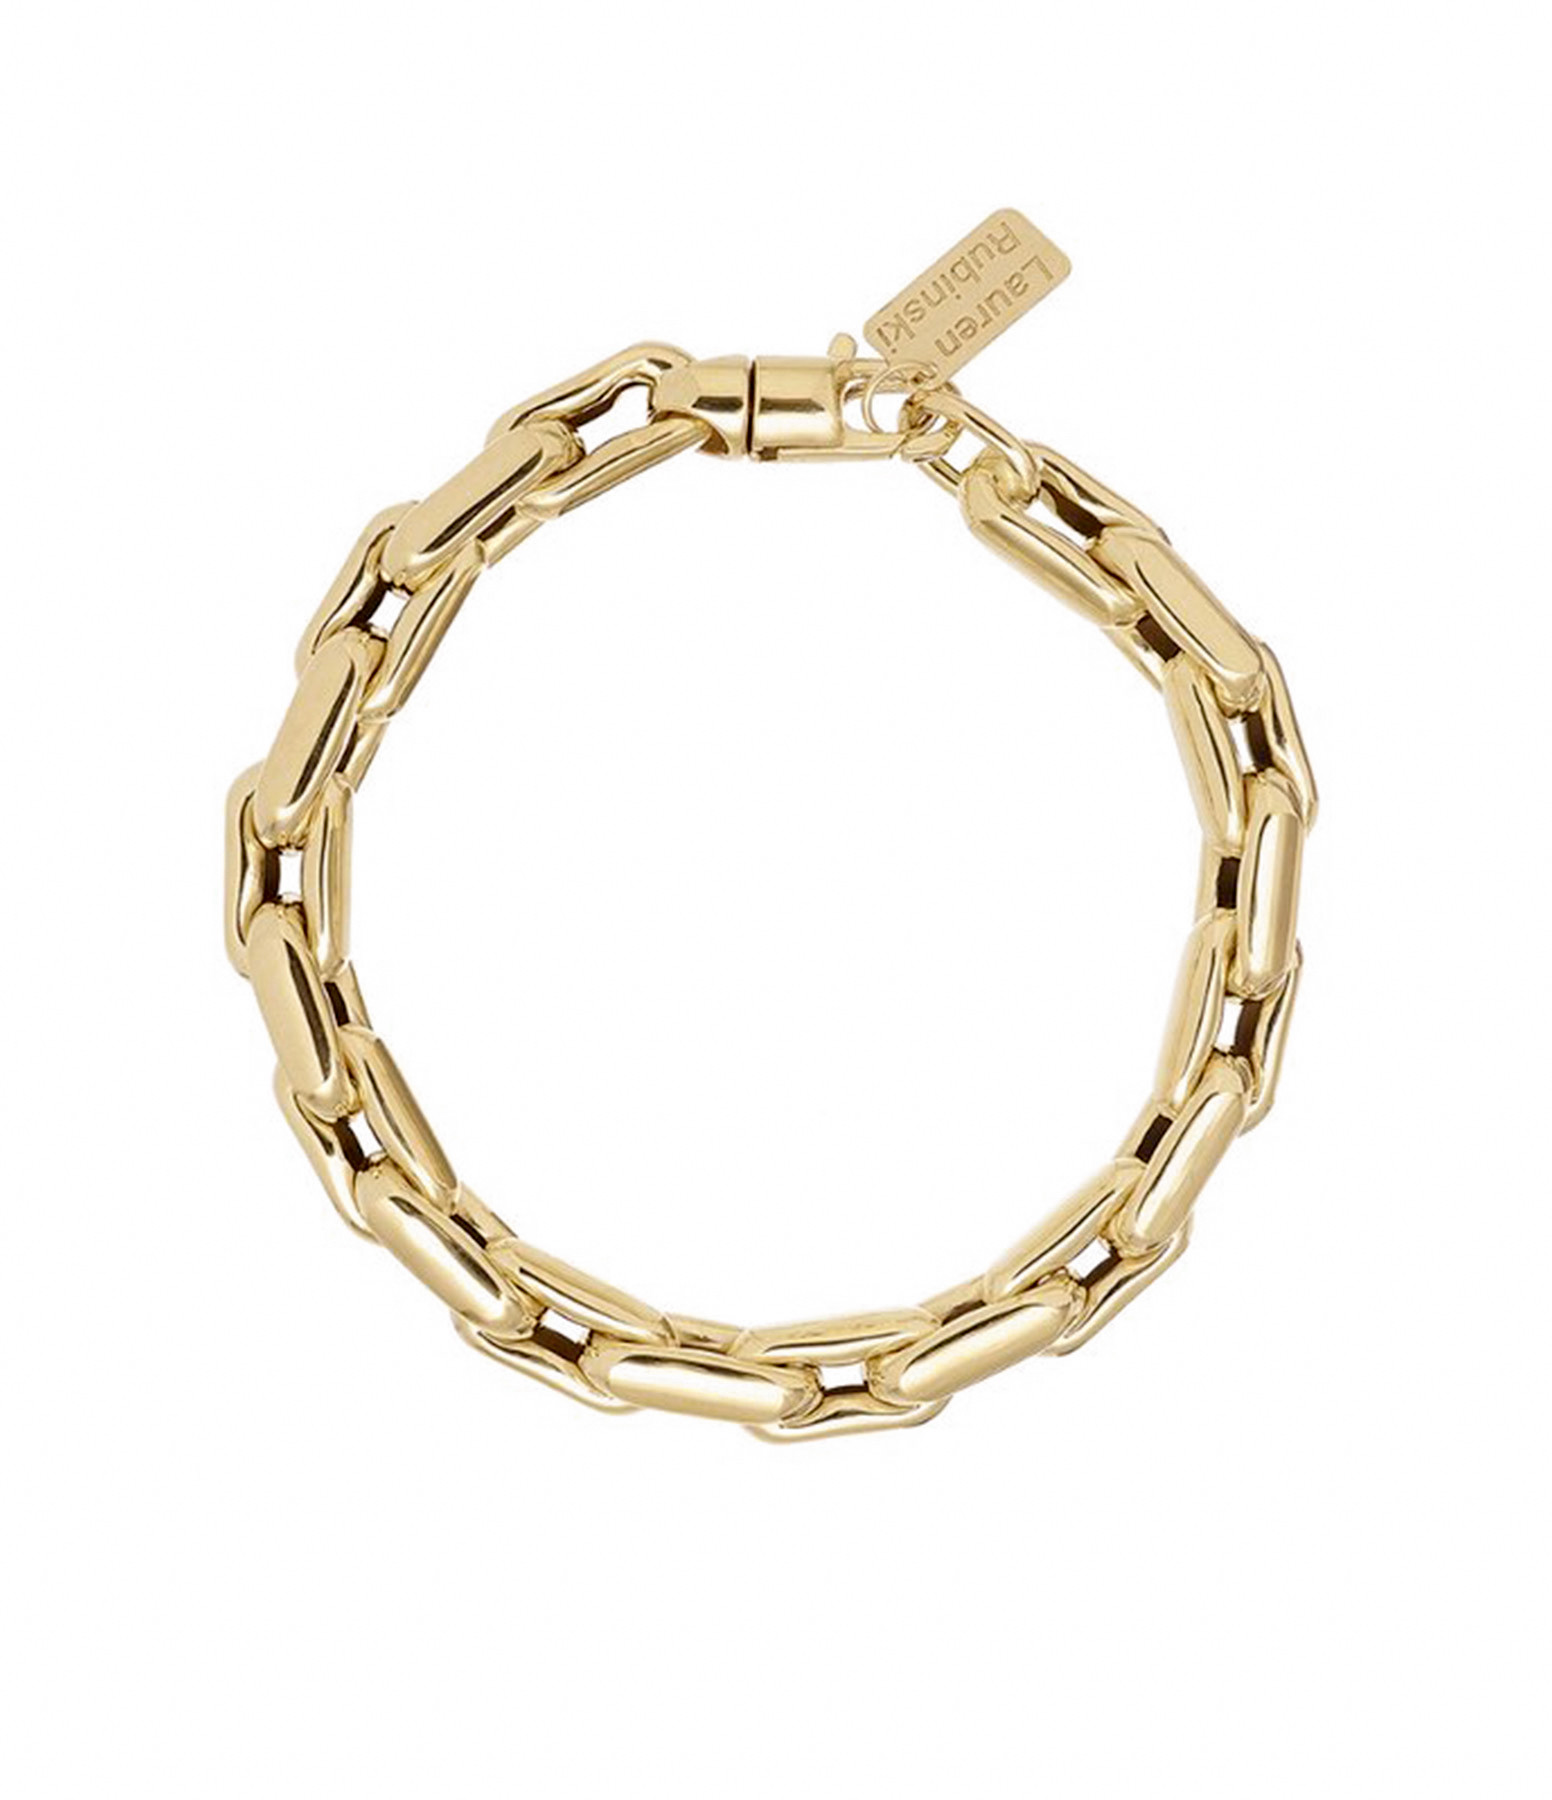 LAUREN RUBINSKI - Bracelet Small 14 carats Or Jaune